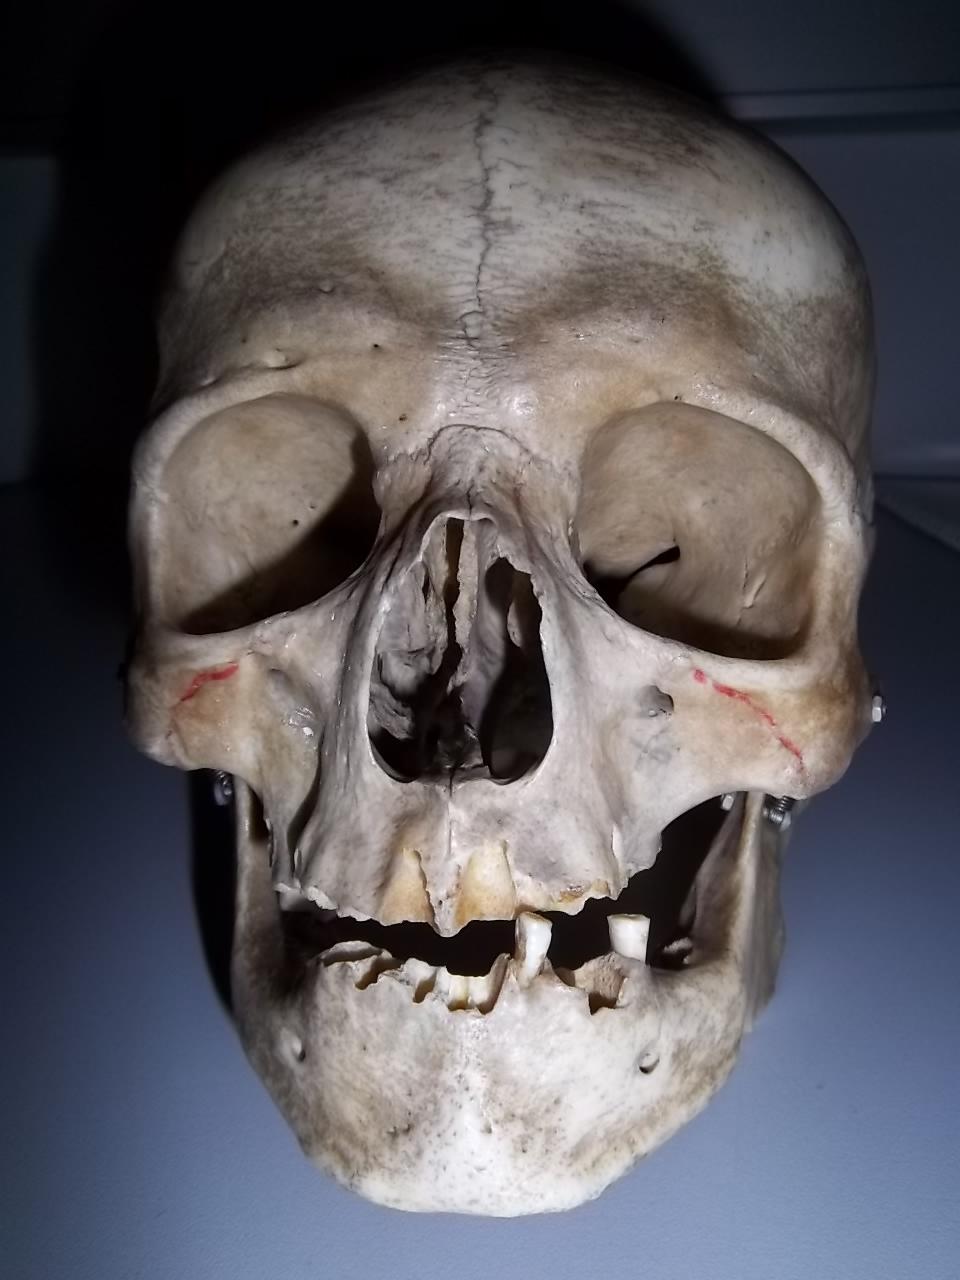 формы норм черепа человека фото фотографа человека